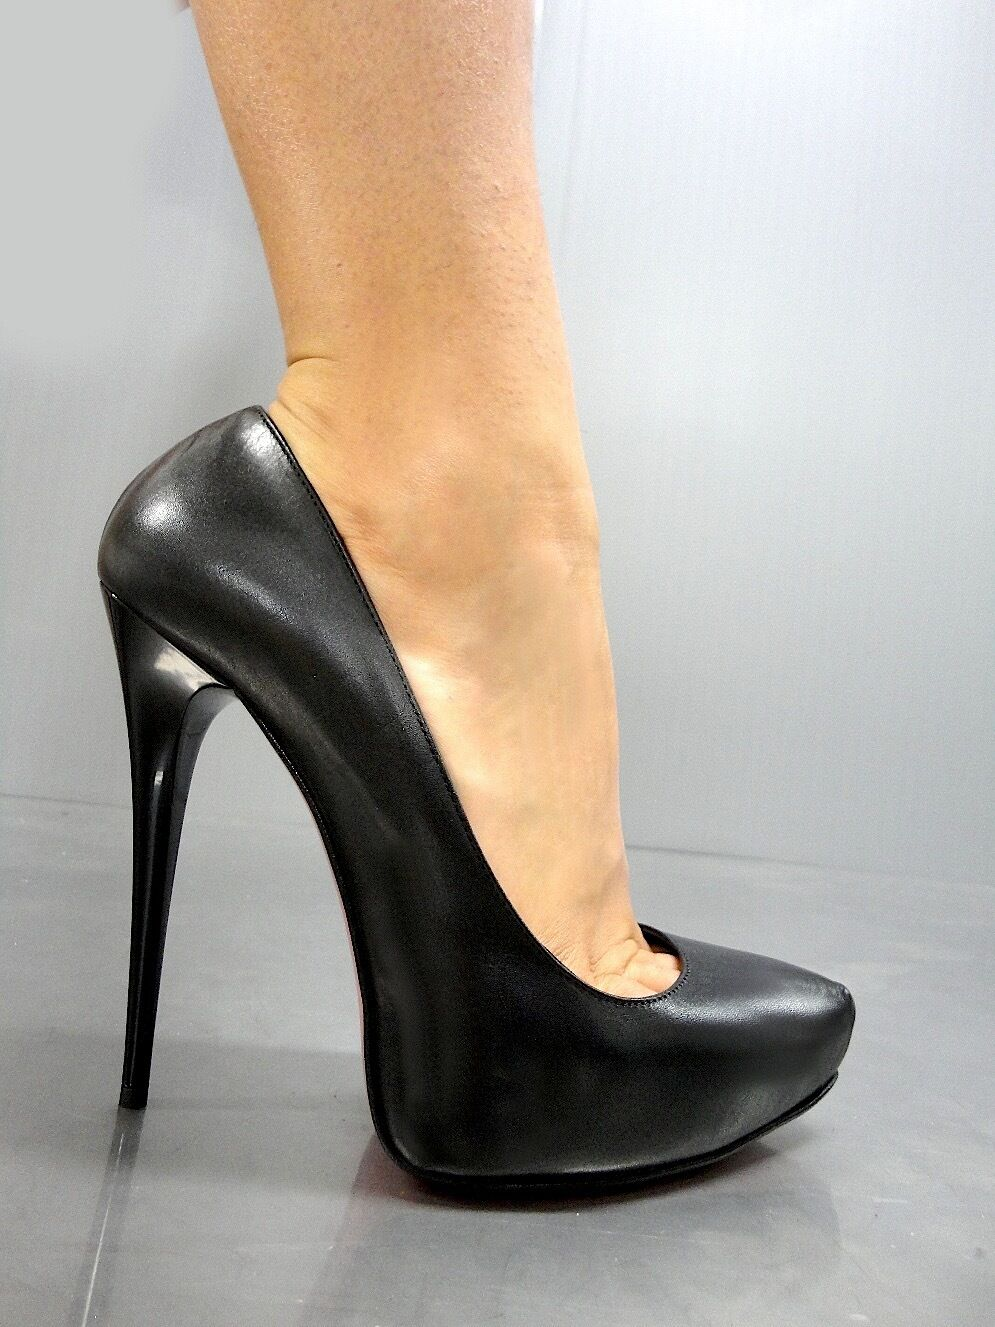 MORI ITALY PLATFORM HIGH HEELS PUMPS chaussures chaussures REAL REAL REAL LEATHER noir noir 40 76bc0d